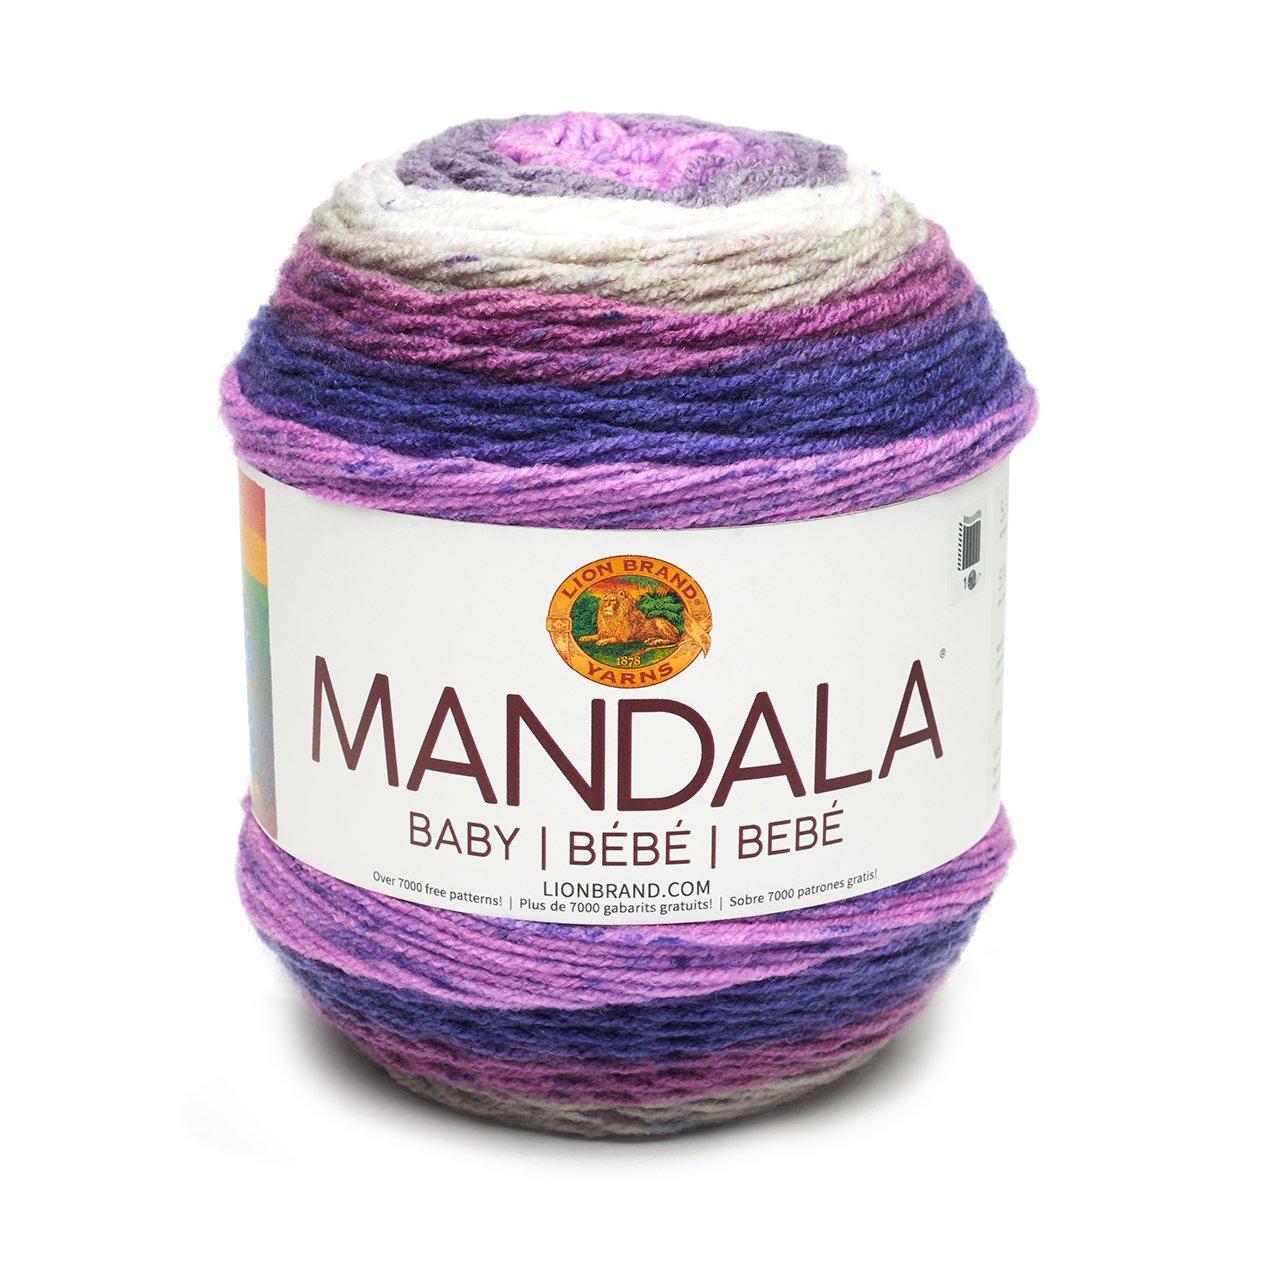 Amazon.com: Lion Brand Mandala Baby Magic Moon - New Color